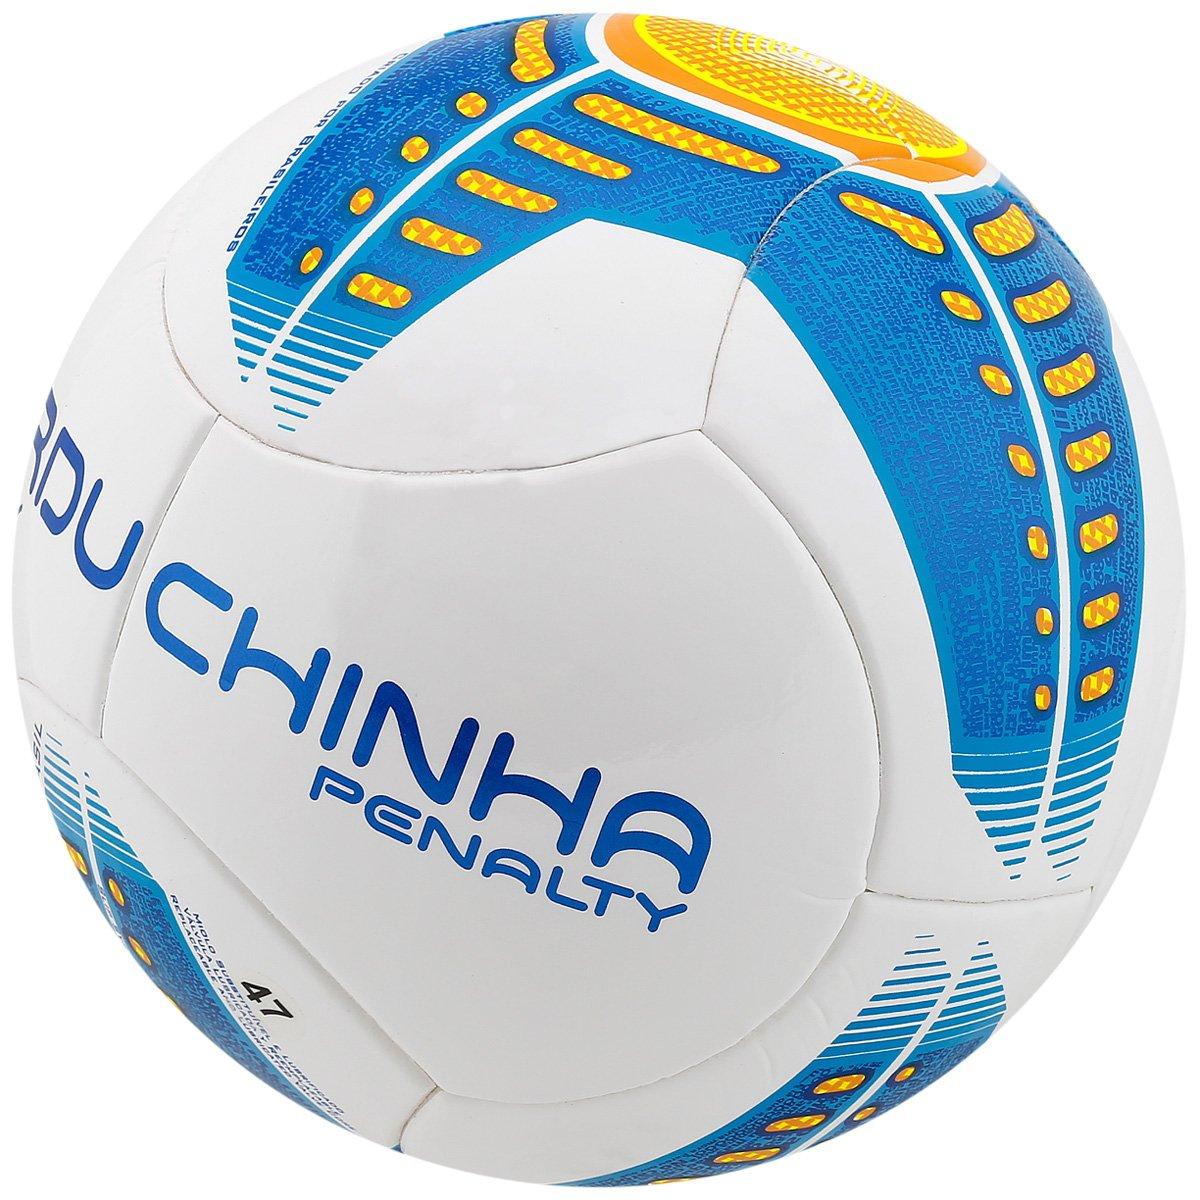 Bola Futebol Penalty Gorduchinha Ultra Fusion 5 Society - Compre ... 0125d3978b74c